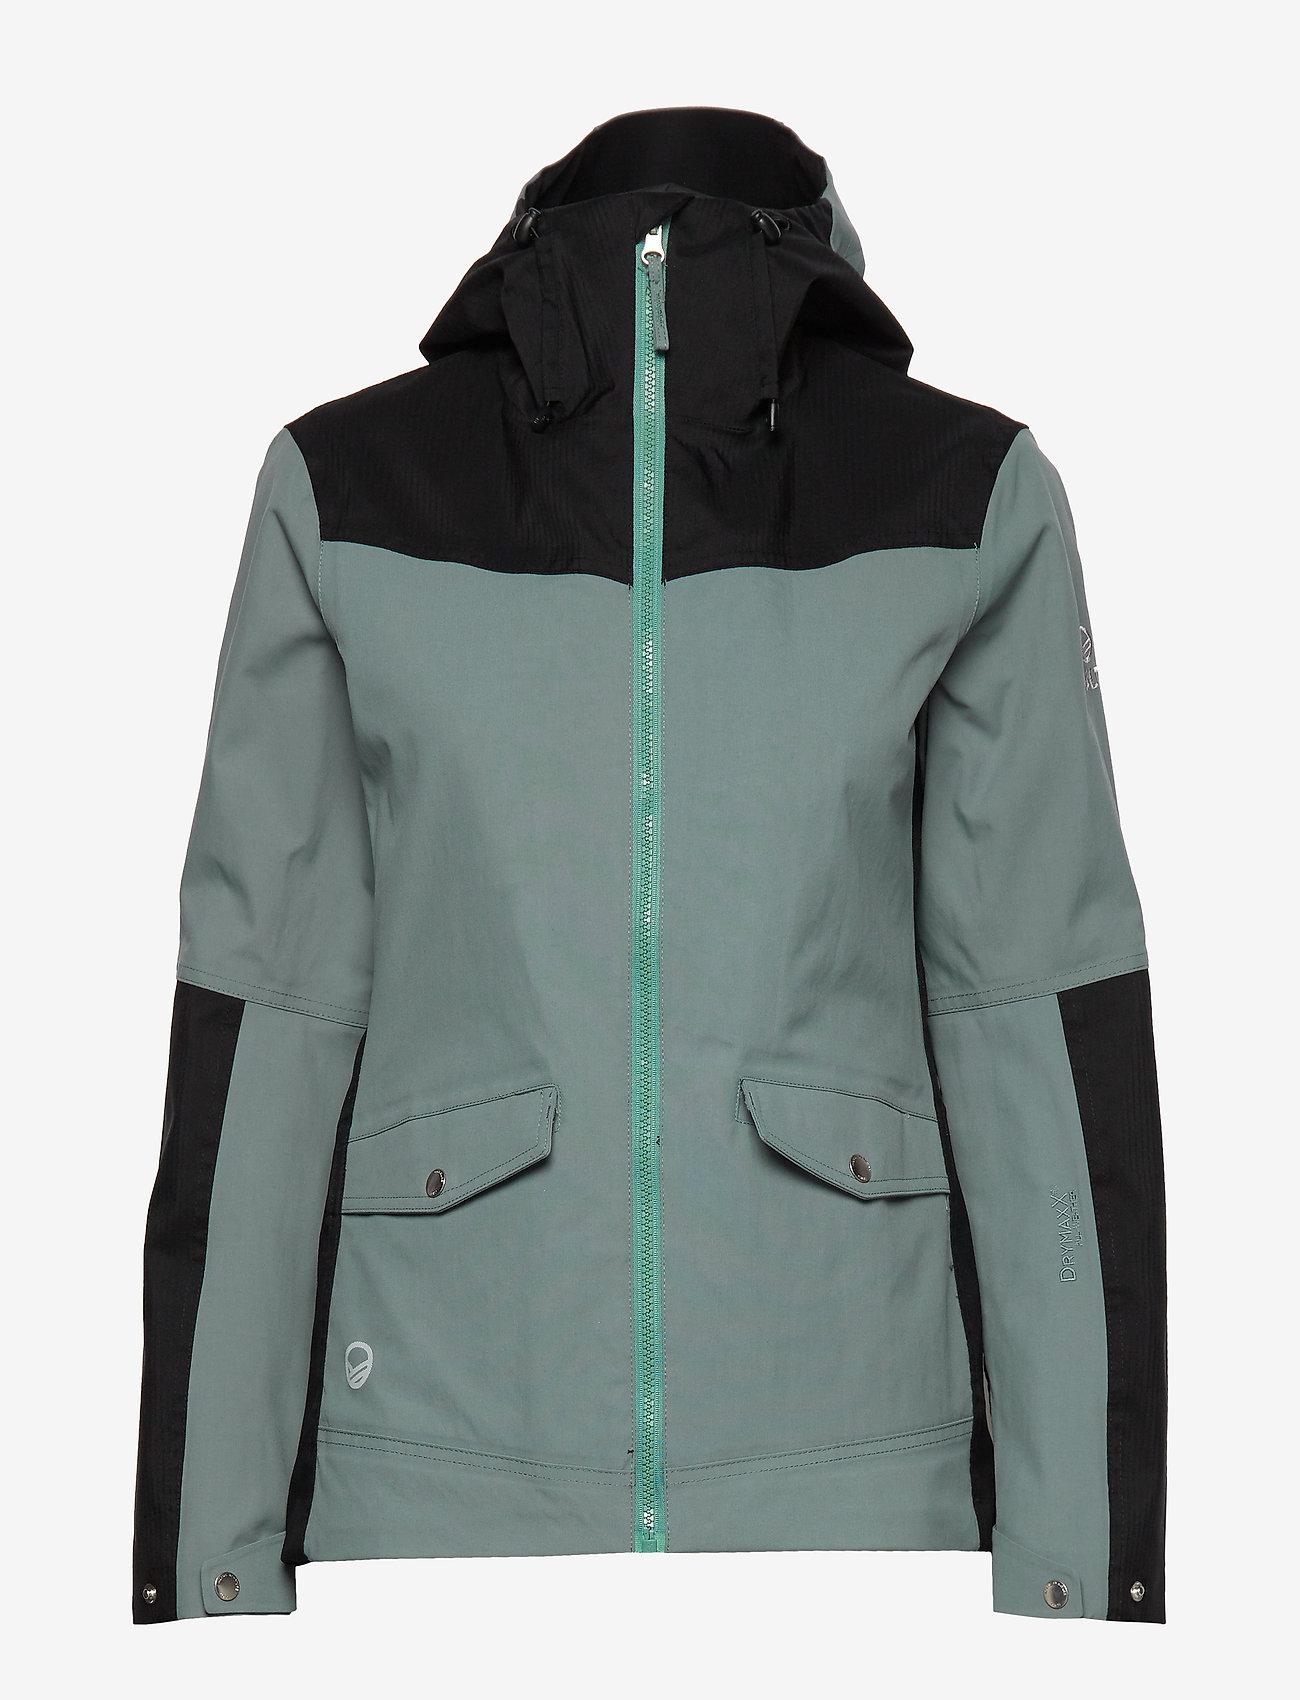 Hiker Women's Drymaxx Outdoor Jacket (Goblin Blue) - Halti ecGGZ9